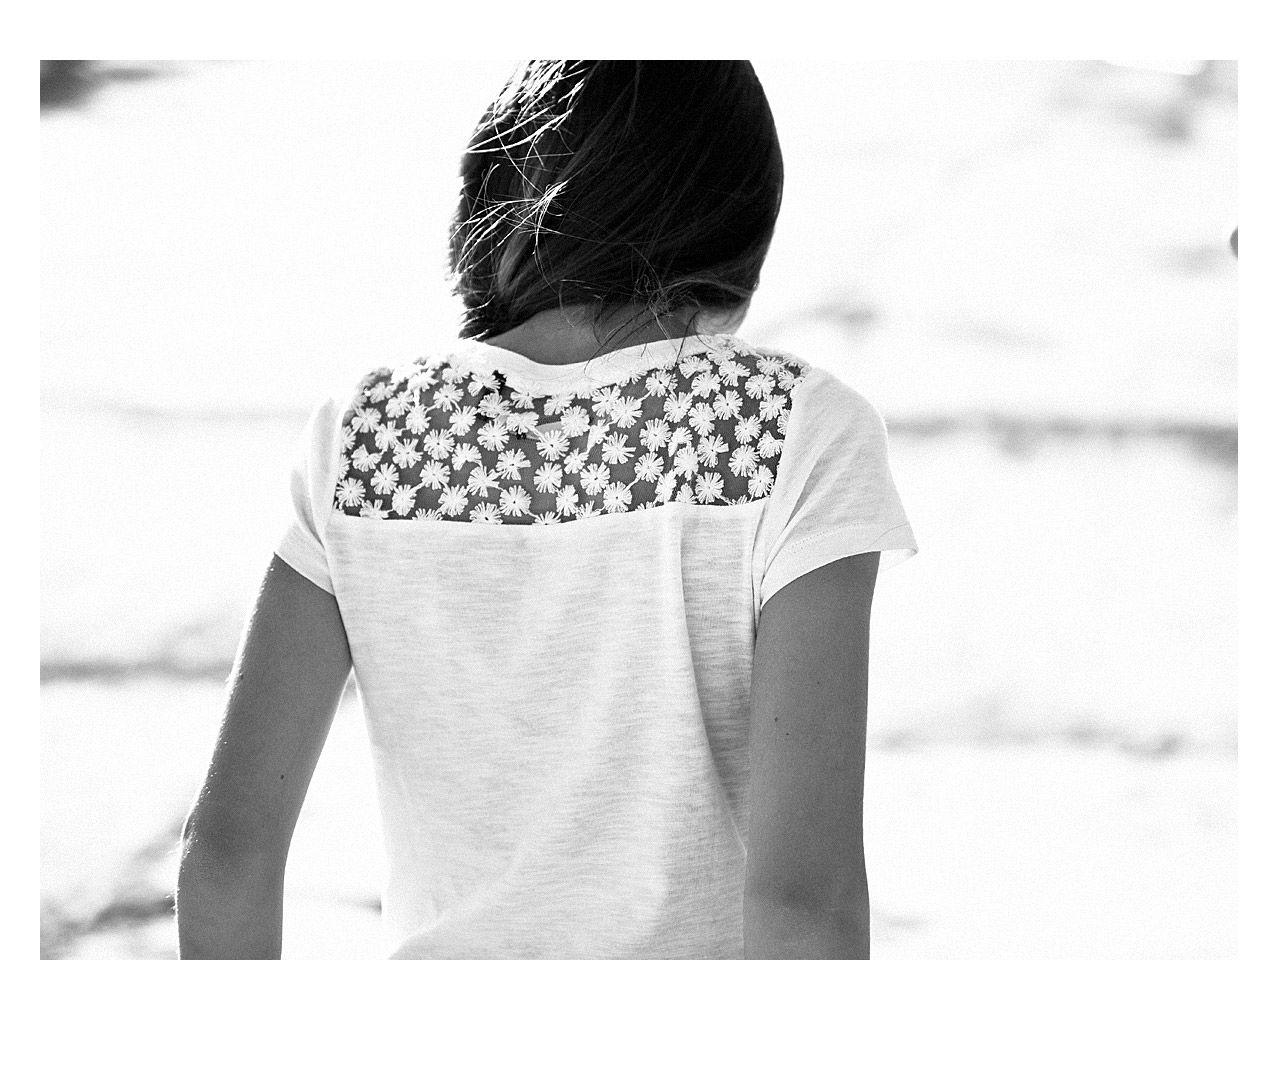 0f4e5f1397582 Look printemps-été 2014 IKKS   tee-shirt fille avec dentelle au dos  SS14   IKKS